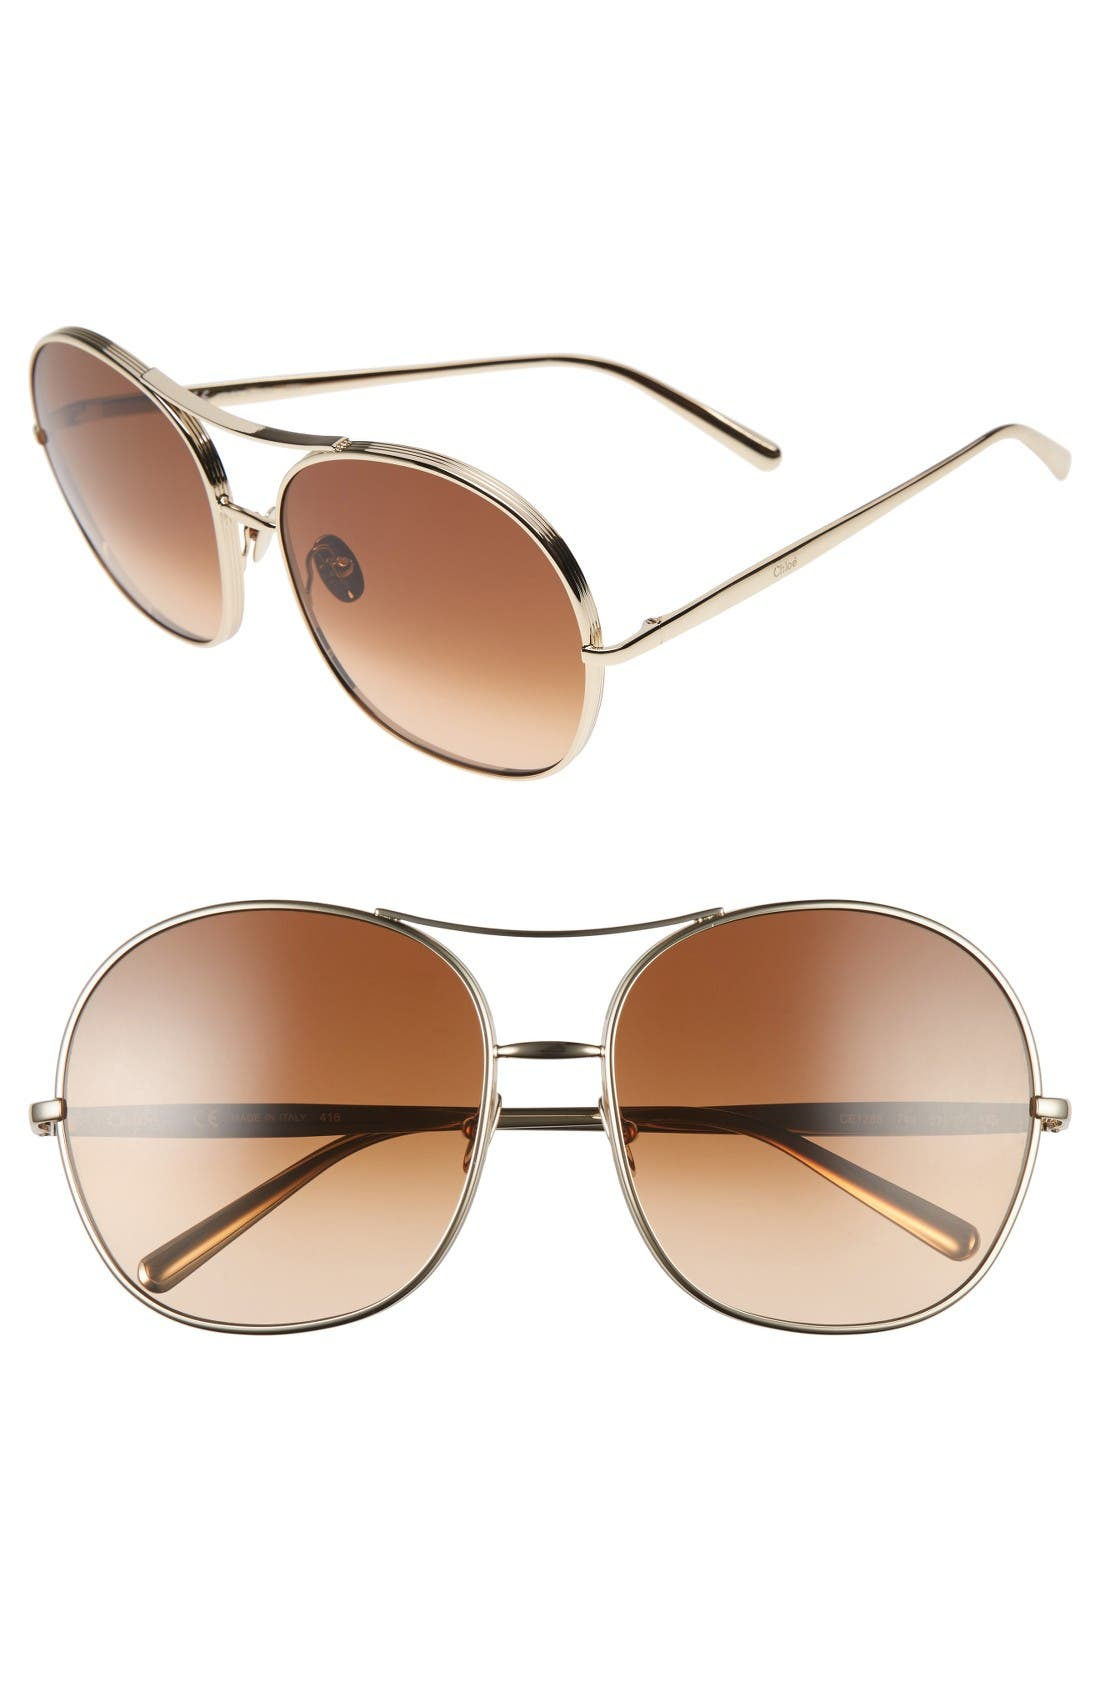 Main Image - Chloé 61mm Oversize Aviator Sunglasses